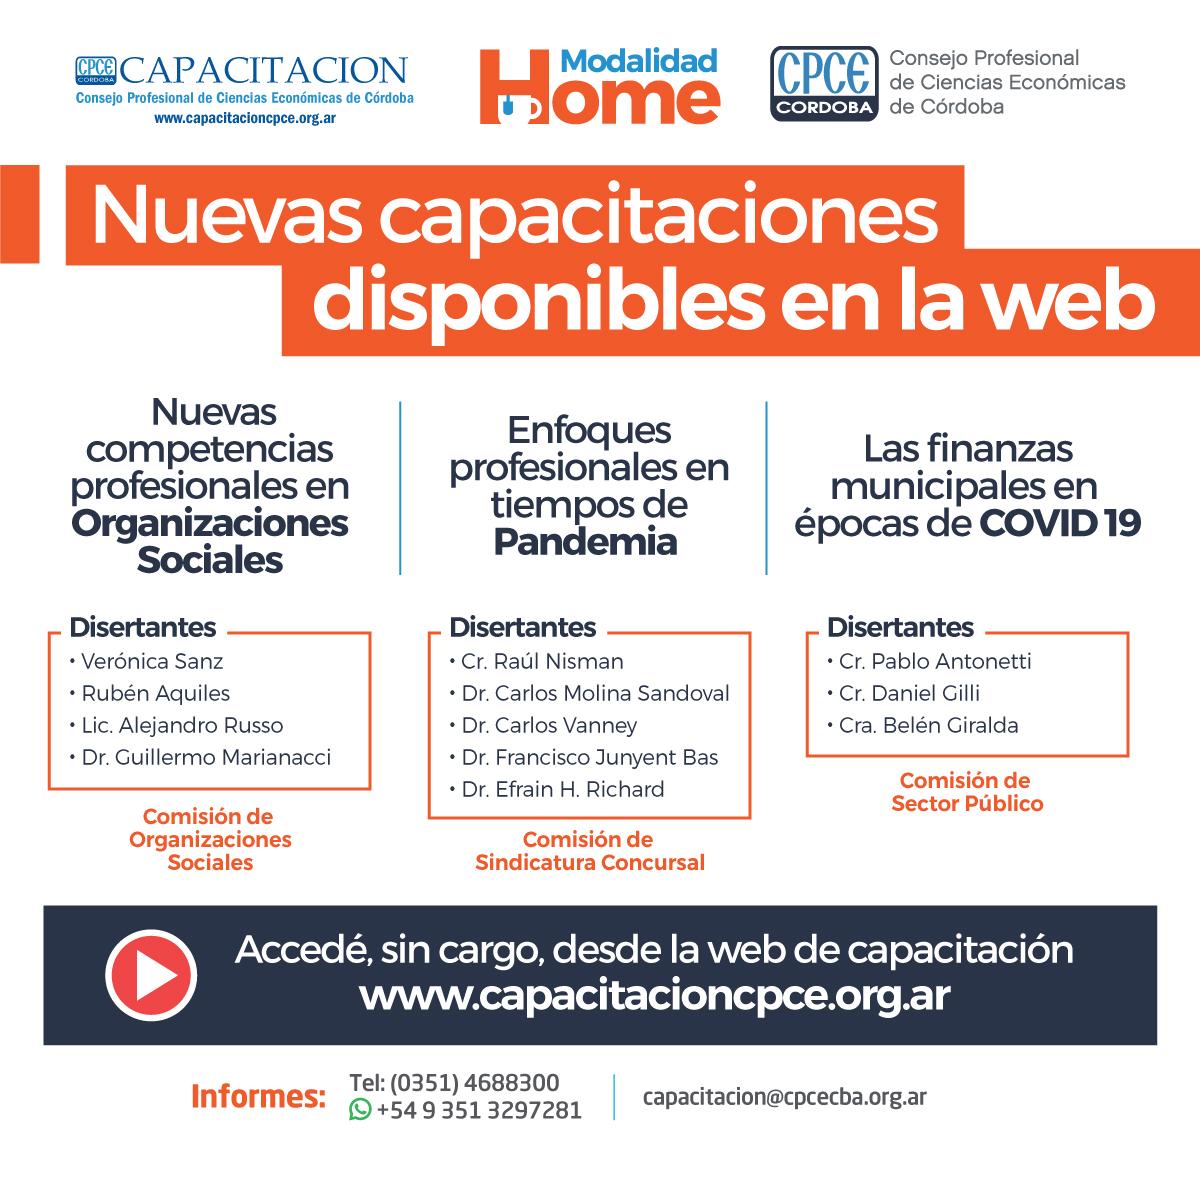 CPCE Córdoba @CPCECordoba: Éstas son las novedades en nuestra web ➡️ https://t.co/SShjf0Afdx https://t.co/n9g2H2EfjL